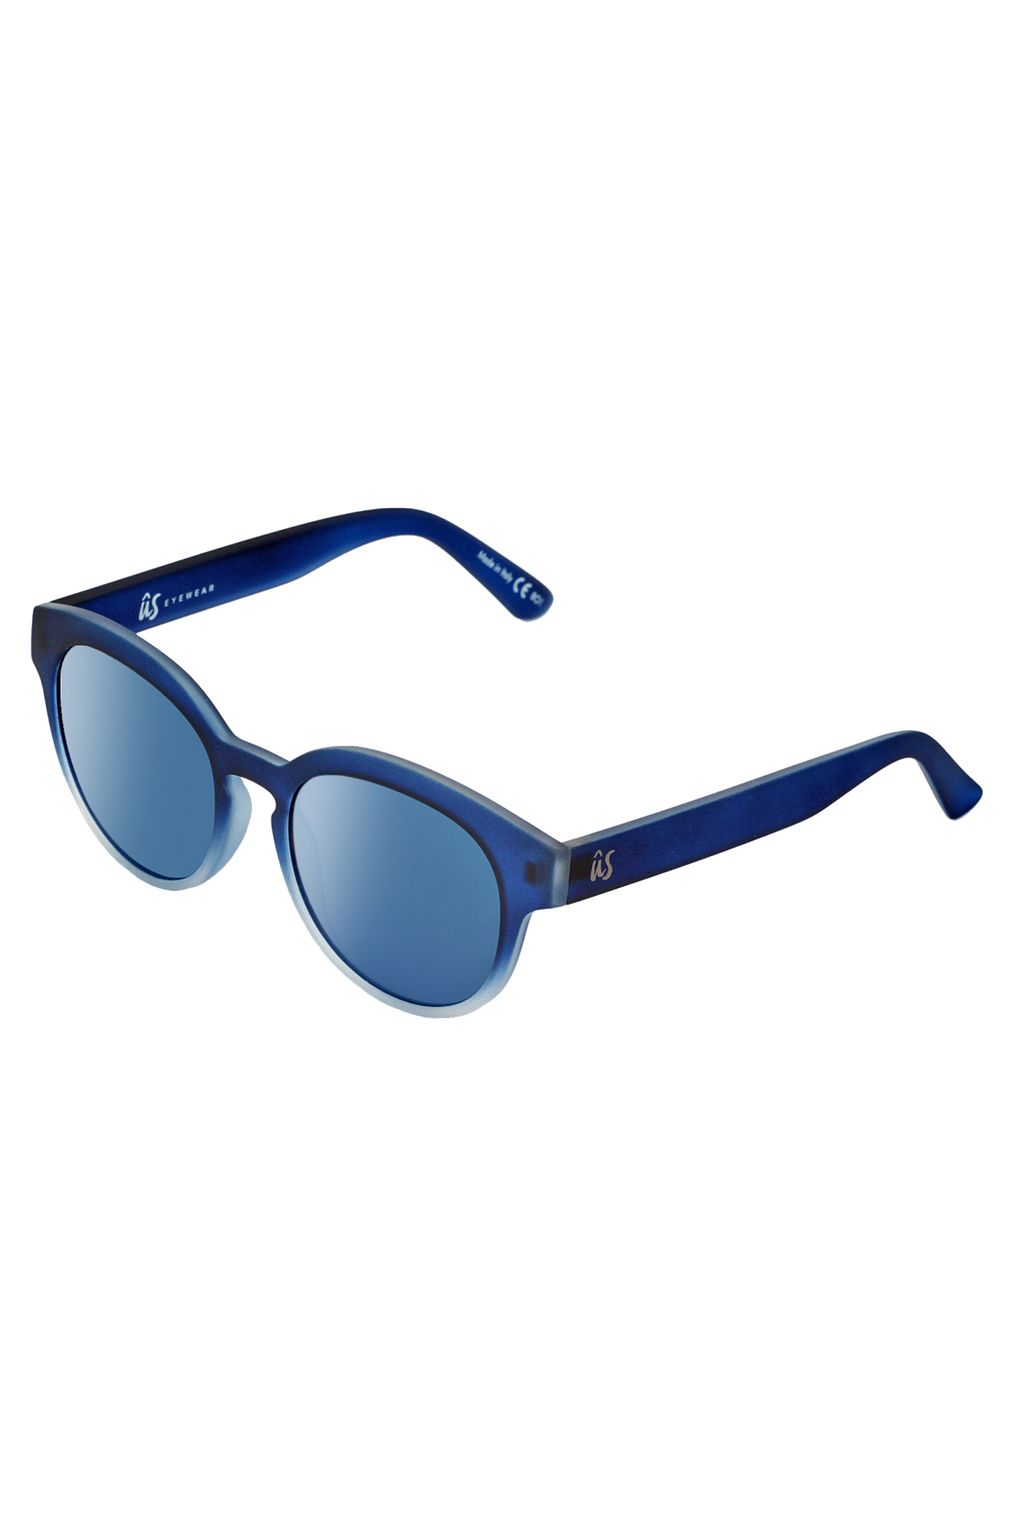 US Sunglasses NATHI Matte Blue Fade To Crystal/Grey Blue Chrome